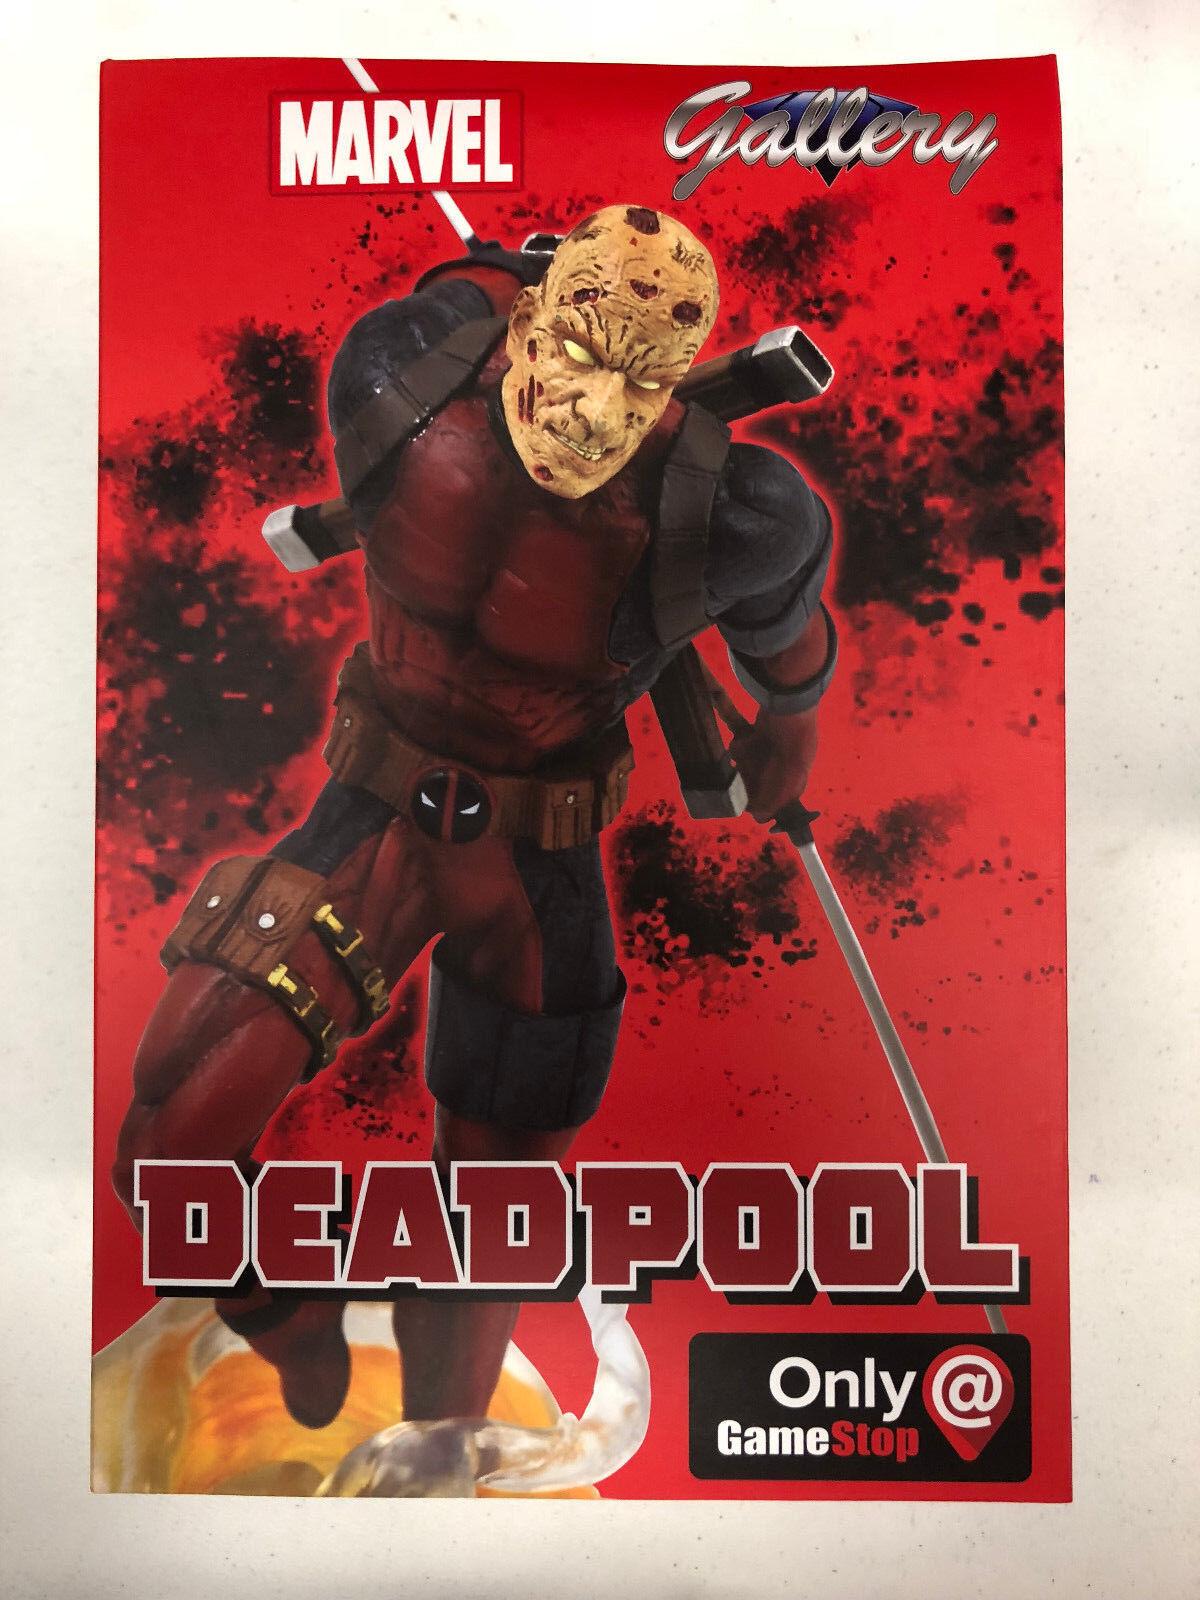 Marvel Deadpool Unmasked 9  PVC Figure GameStop Exlusive Diamond Gallery